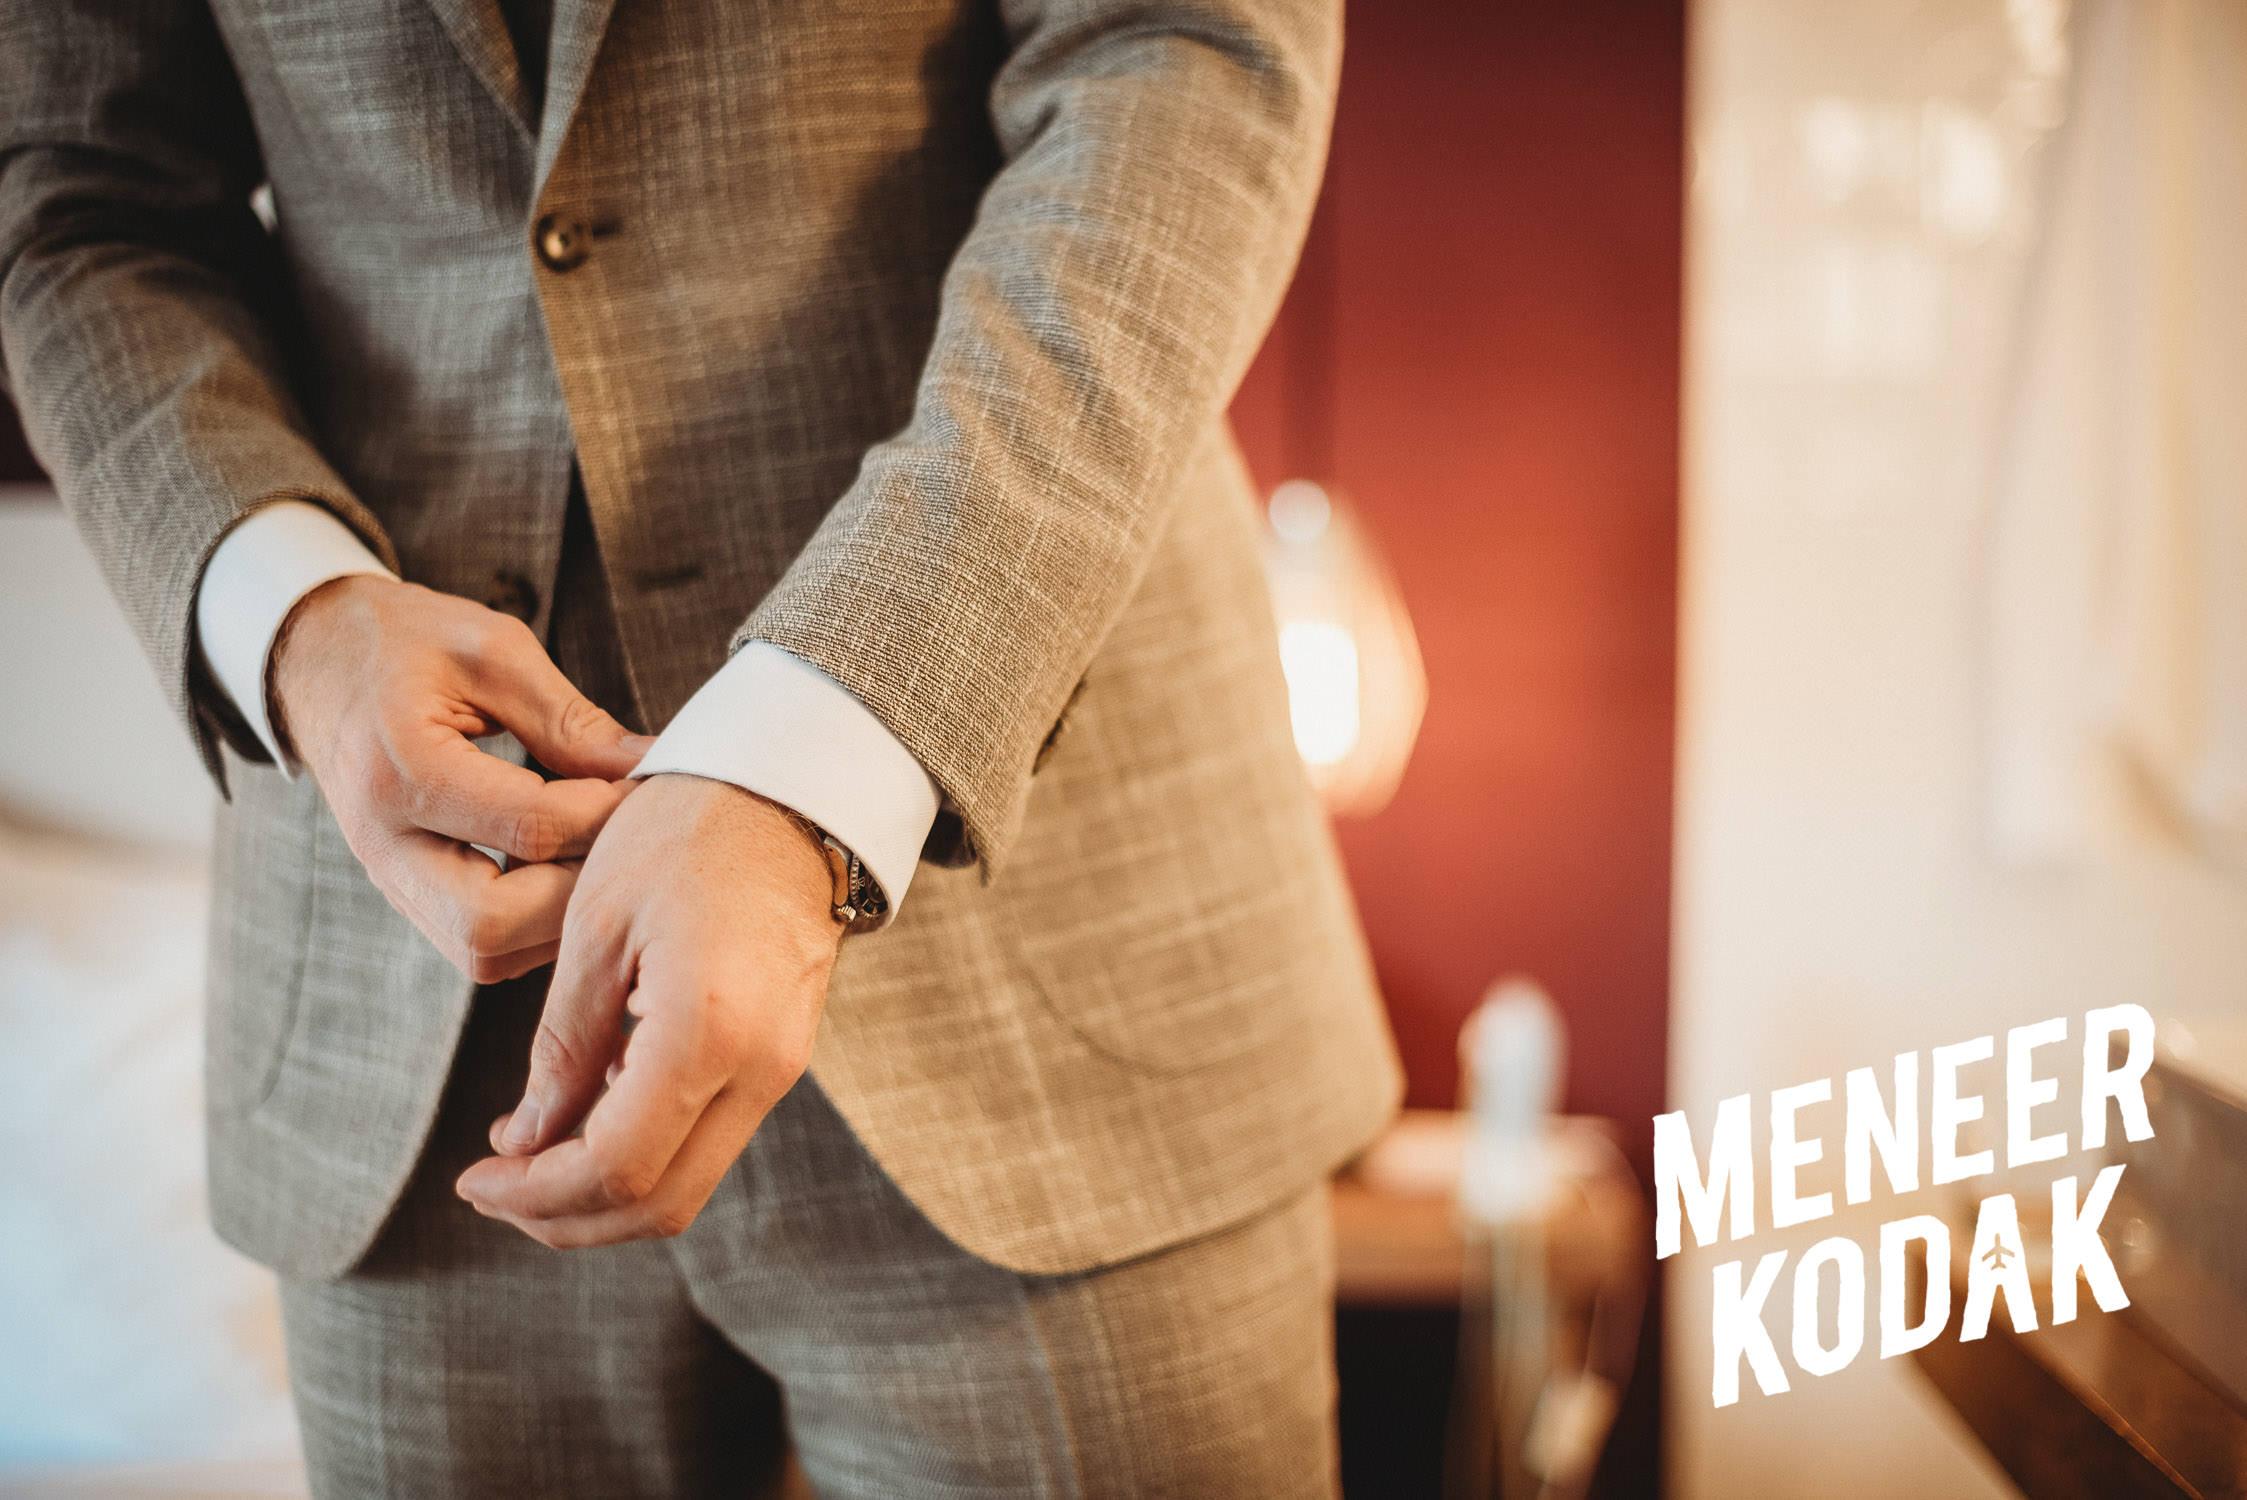 Meneer Kodak - Strandbruiloft - Noordwijk - K&A-060.jpg